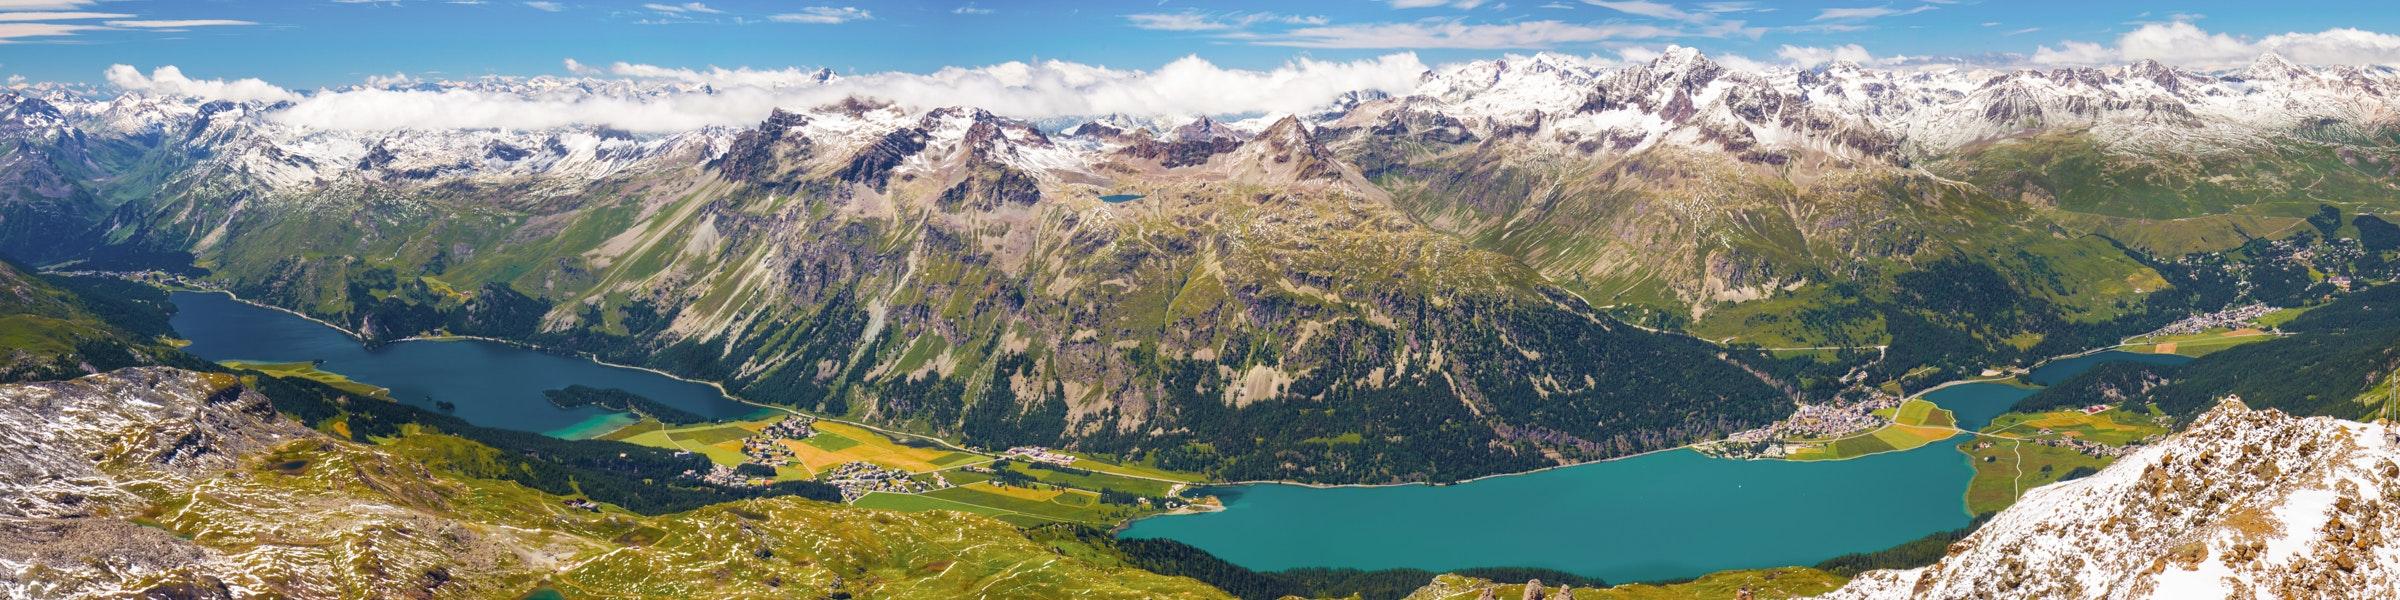 View from Murtèl on Mount Corvatsch